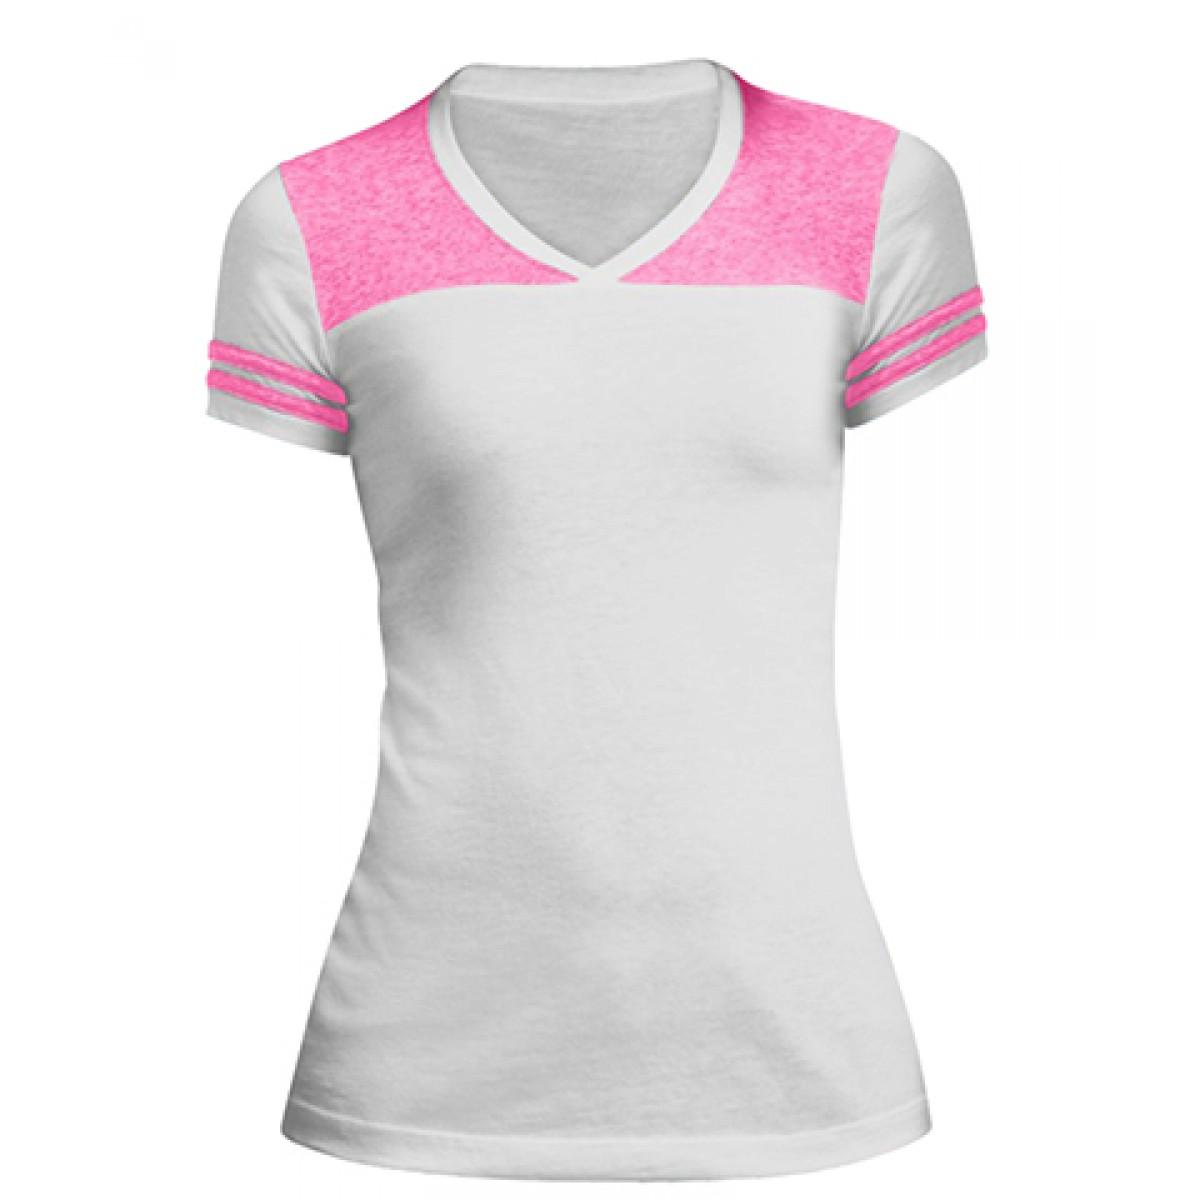 Juniors Varsity V-Neck Tee-White/Pink-3XL